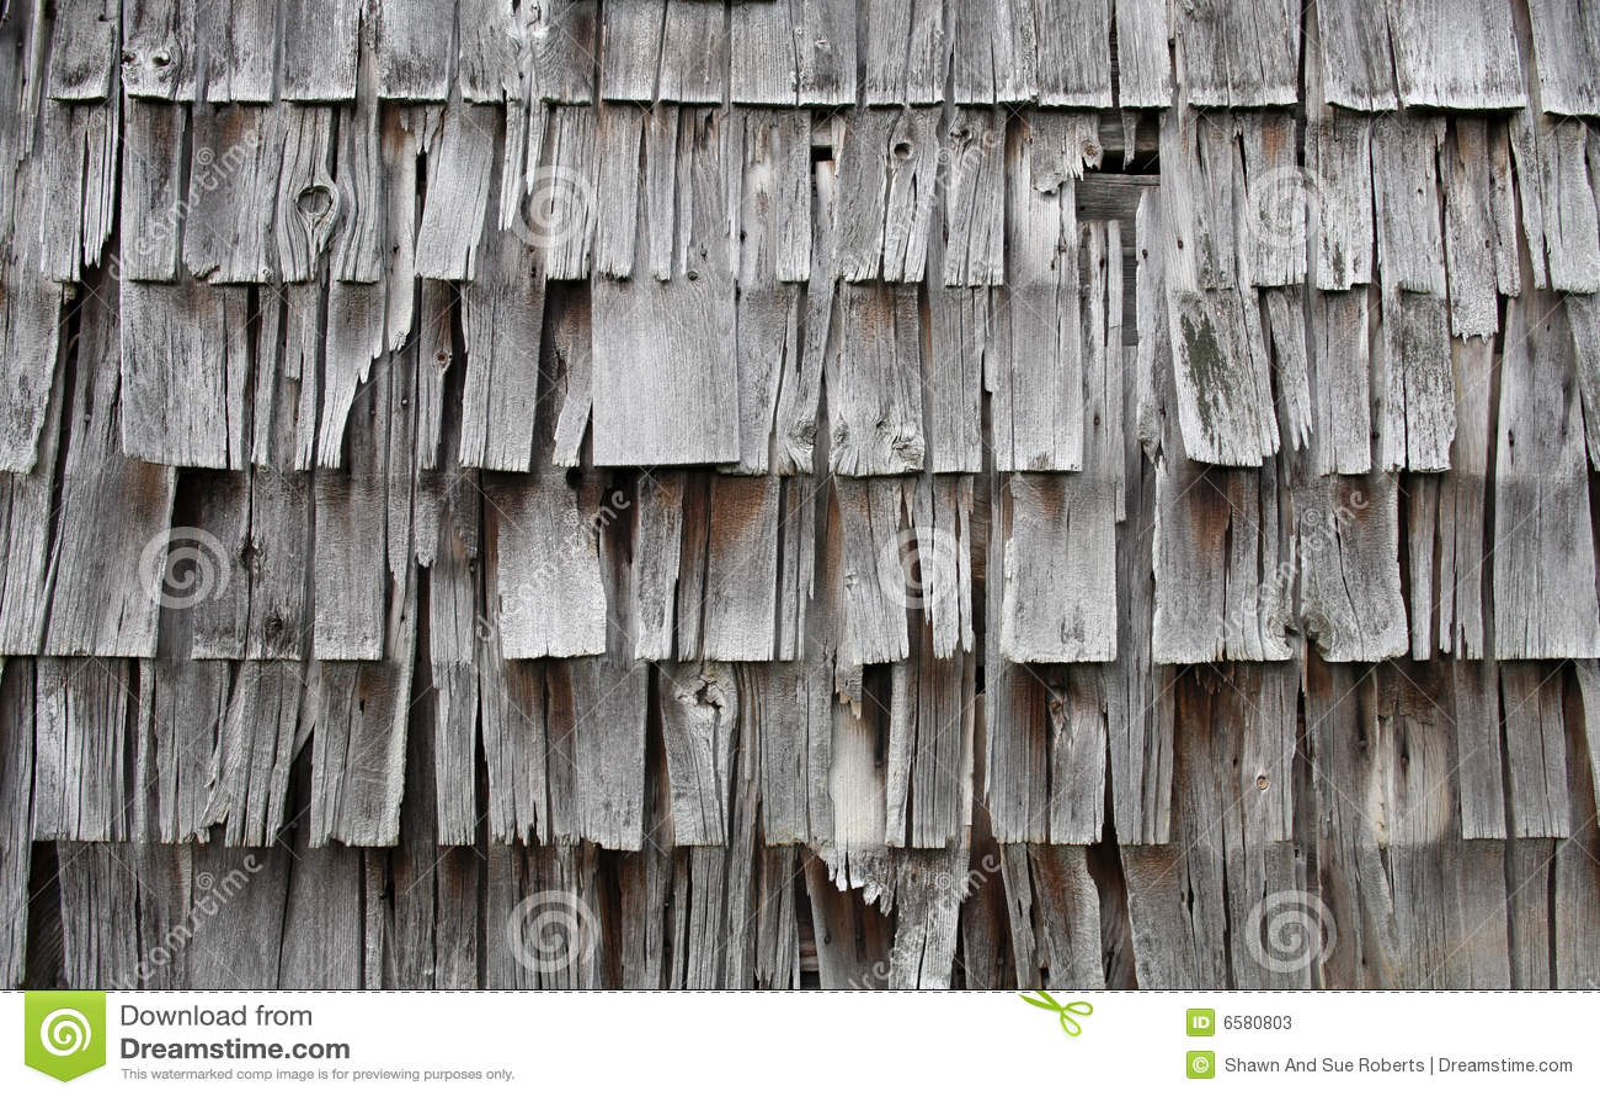 Old Broken Weathered Shingles Stock Photos Image 6580803